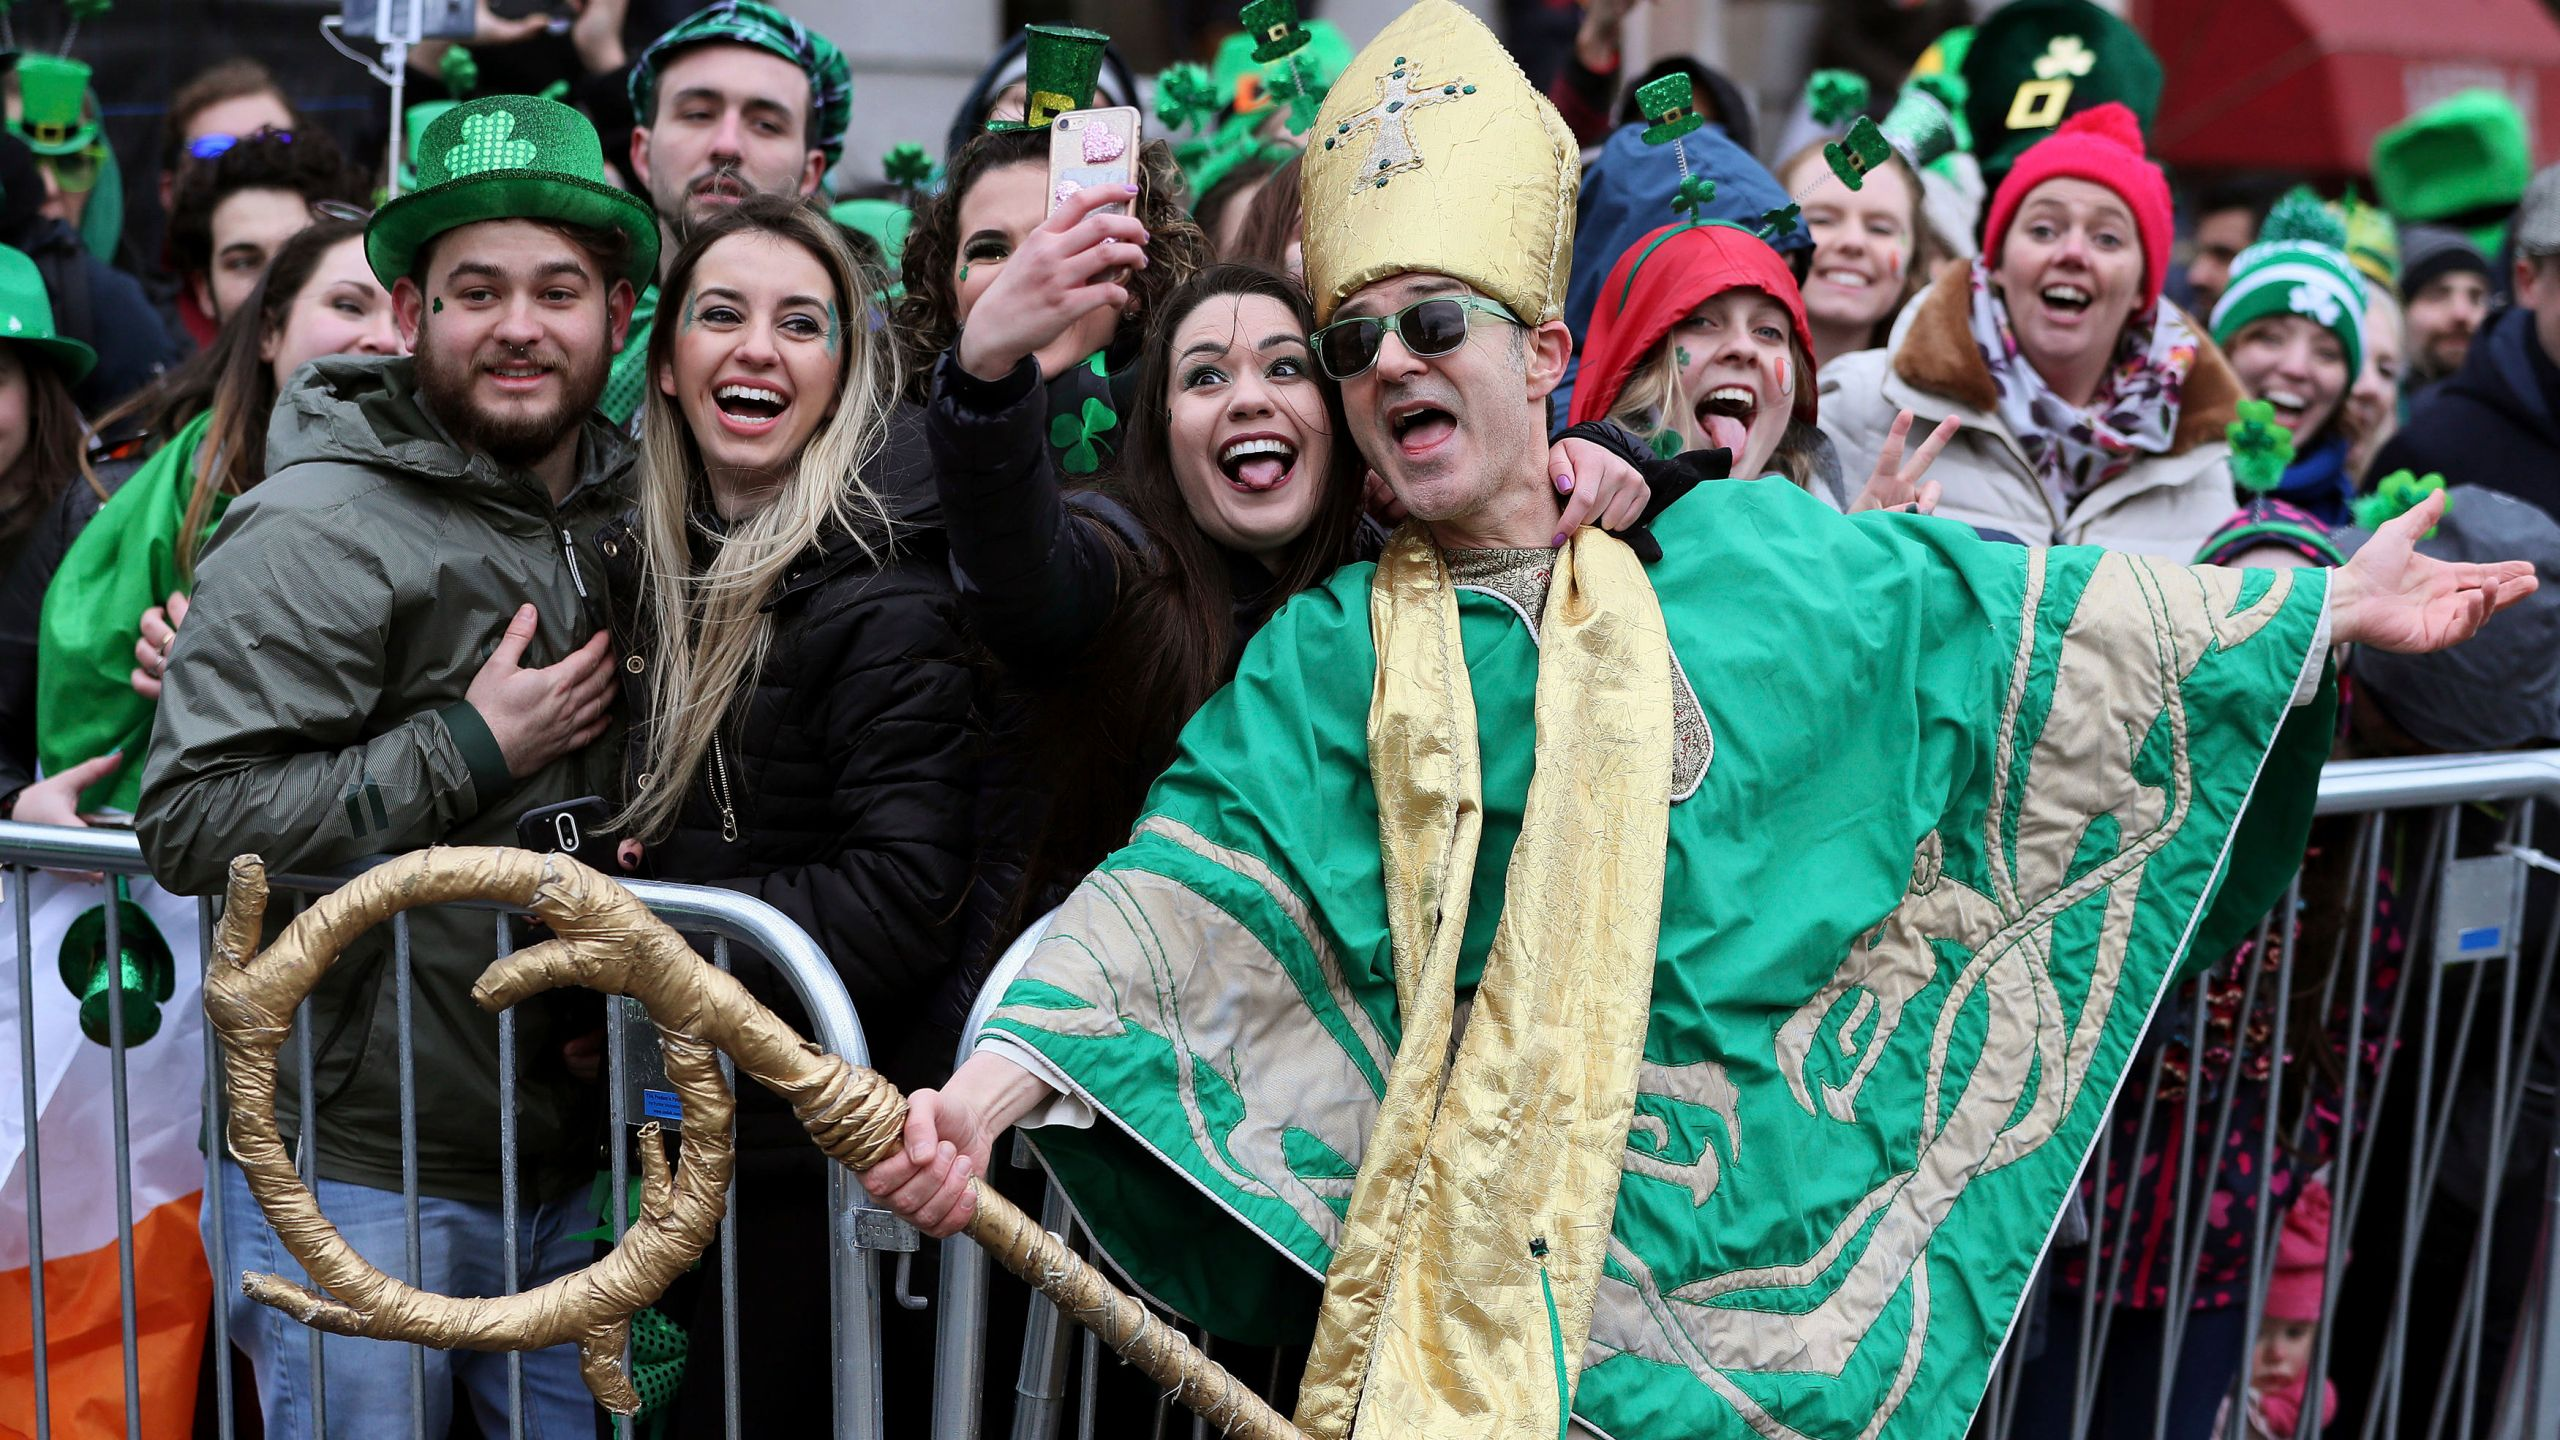 Ireland_St._Patrick's_Day_18253-159532.jpg07885165